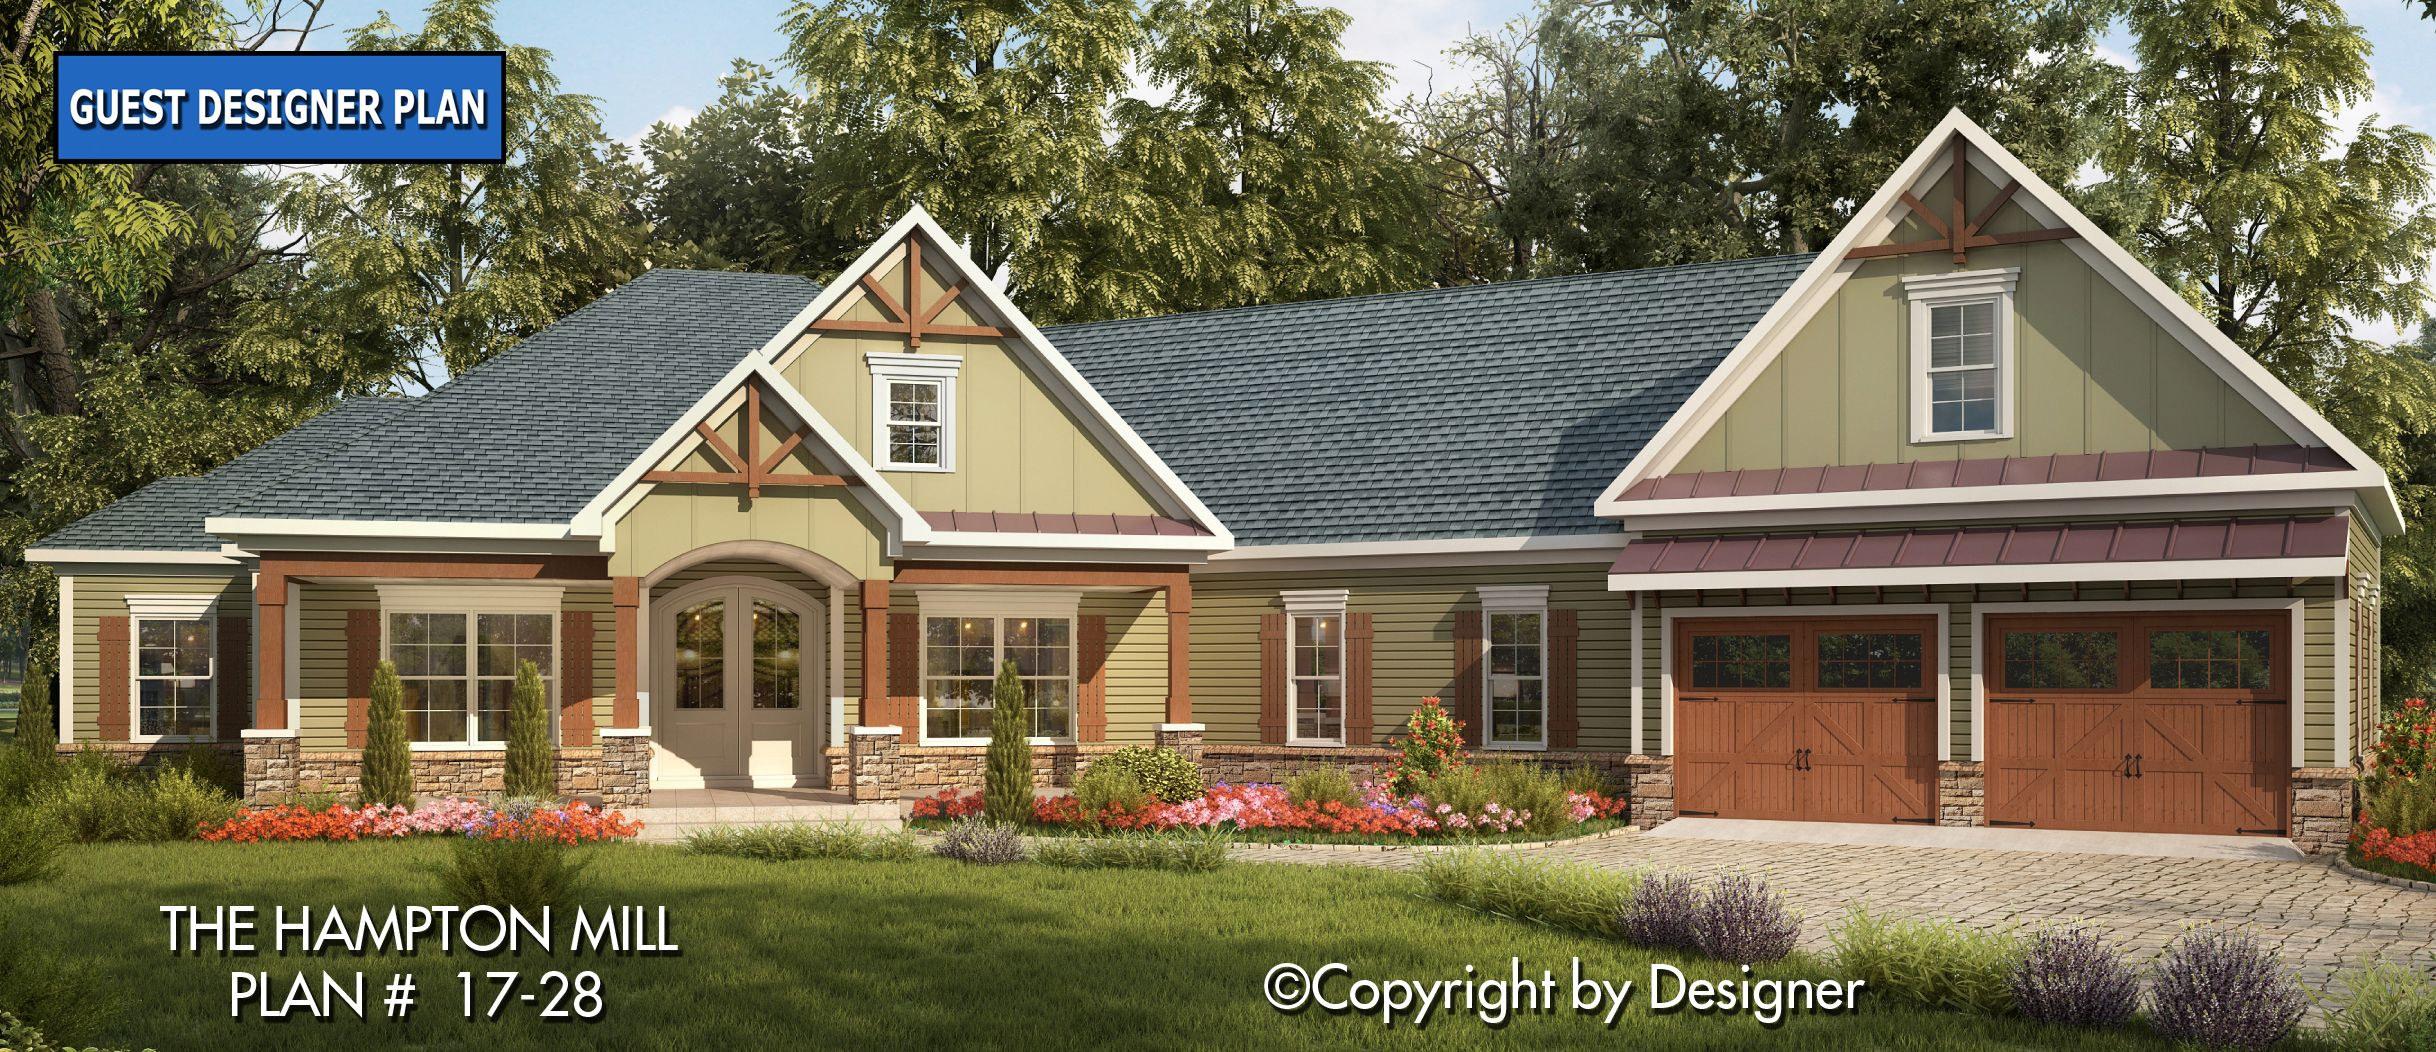 Hampton Mill House Plan 17 28 Kt Garrell Associates Inc Craftsman Style House Plans Coastal House Plans House Plans